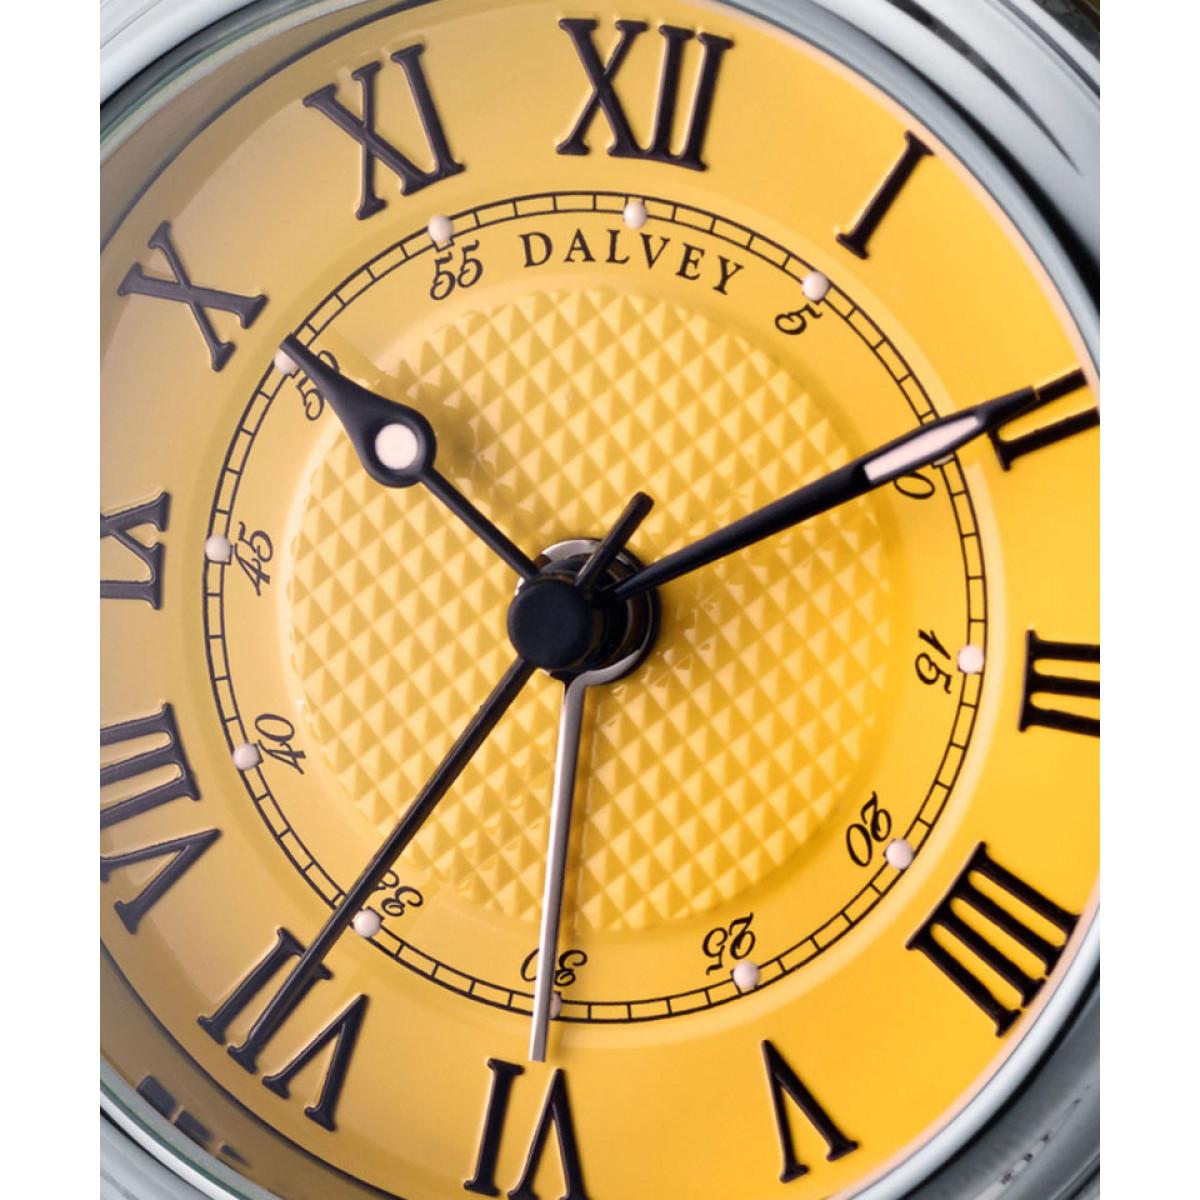 ceas voyager dalvey